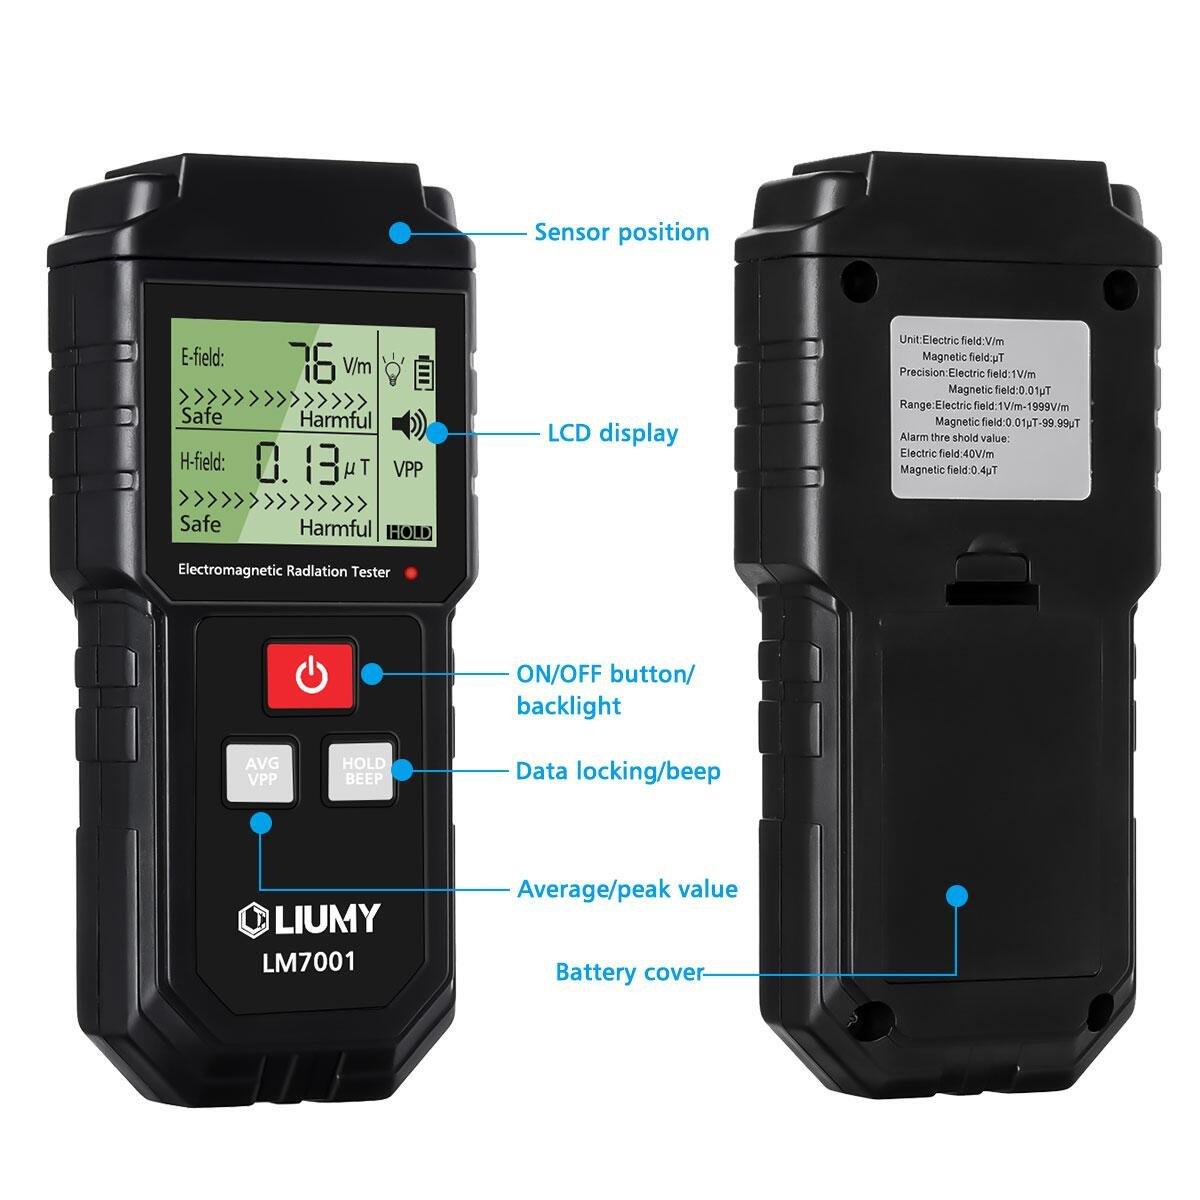 Electromagnetic Field Radiation Detector / EMF Meter, LIUMY Handheld Mini  Digital LCD EMF Detector Dosimeter Tester Counter, Magnetic Field Radiation